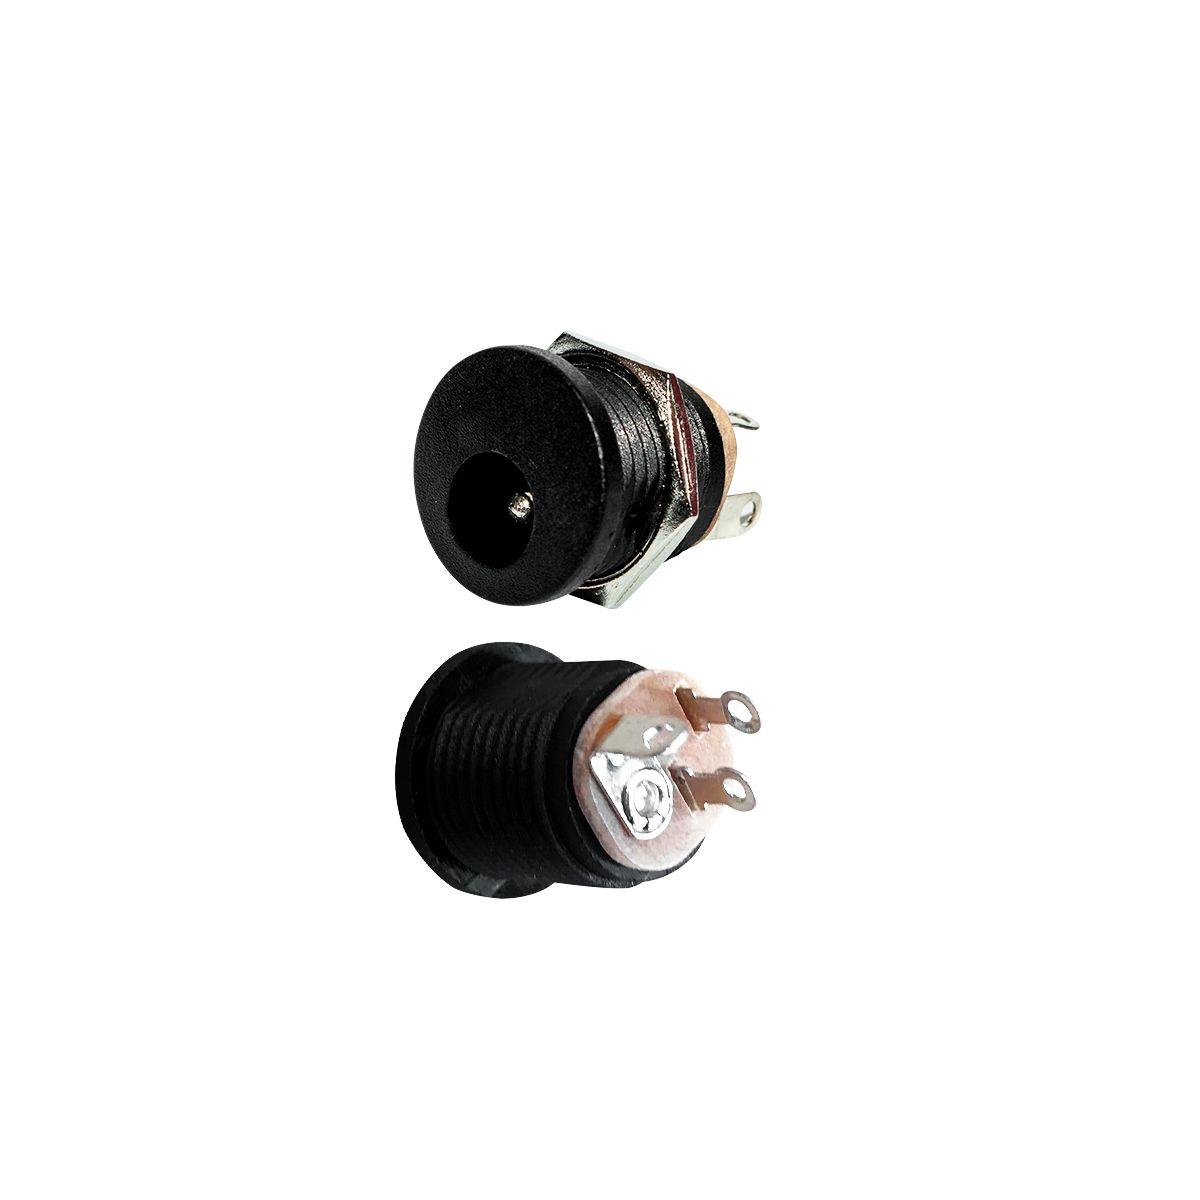 Kit 50 Unidades Conector Plug De Energia P4 Macho + 50 Unidades Plug Jack Tipo P4 Fêmea Com Rosca